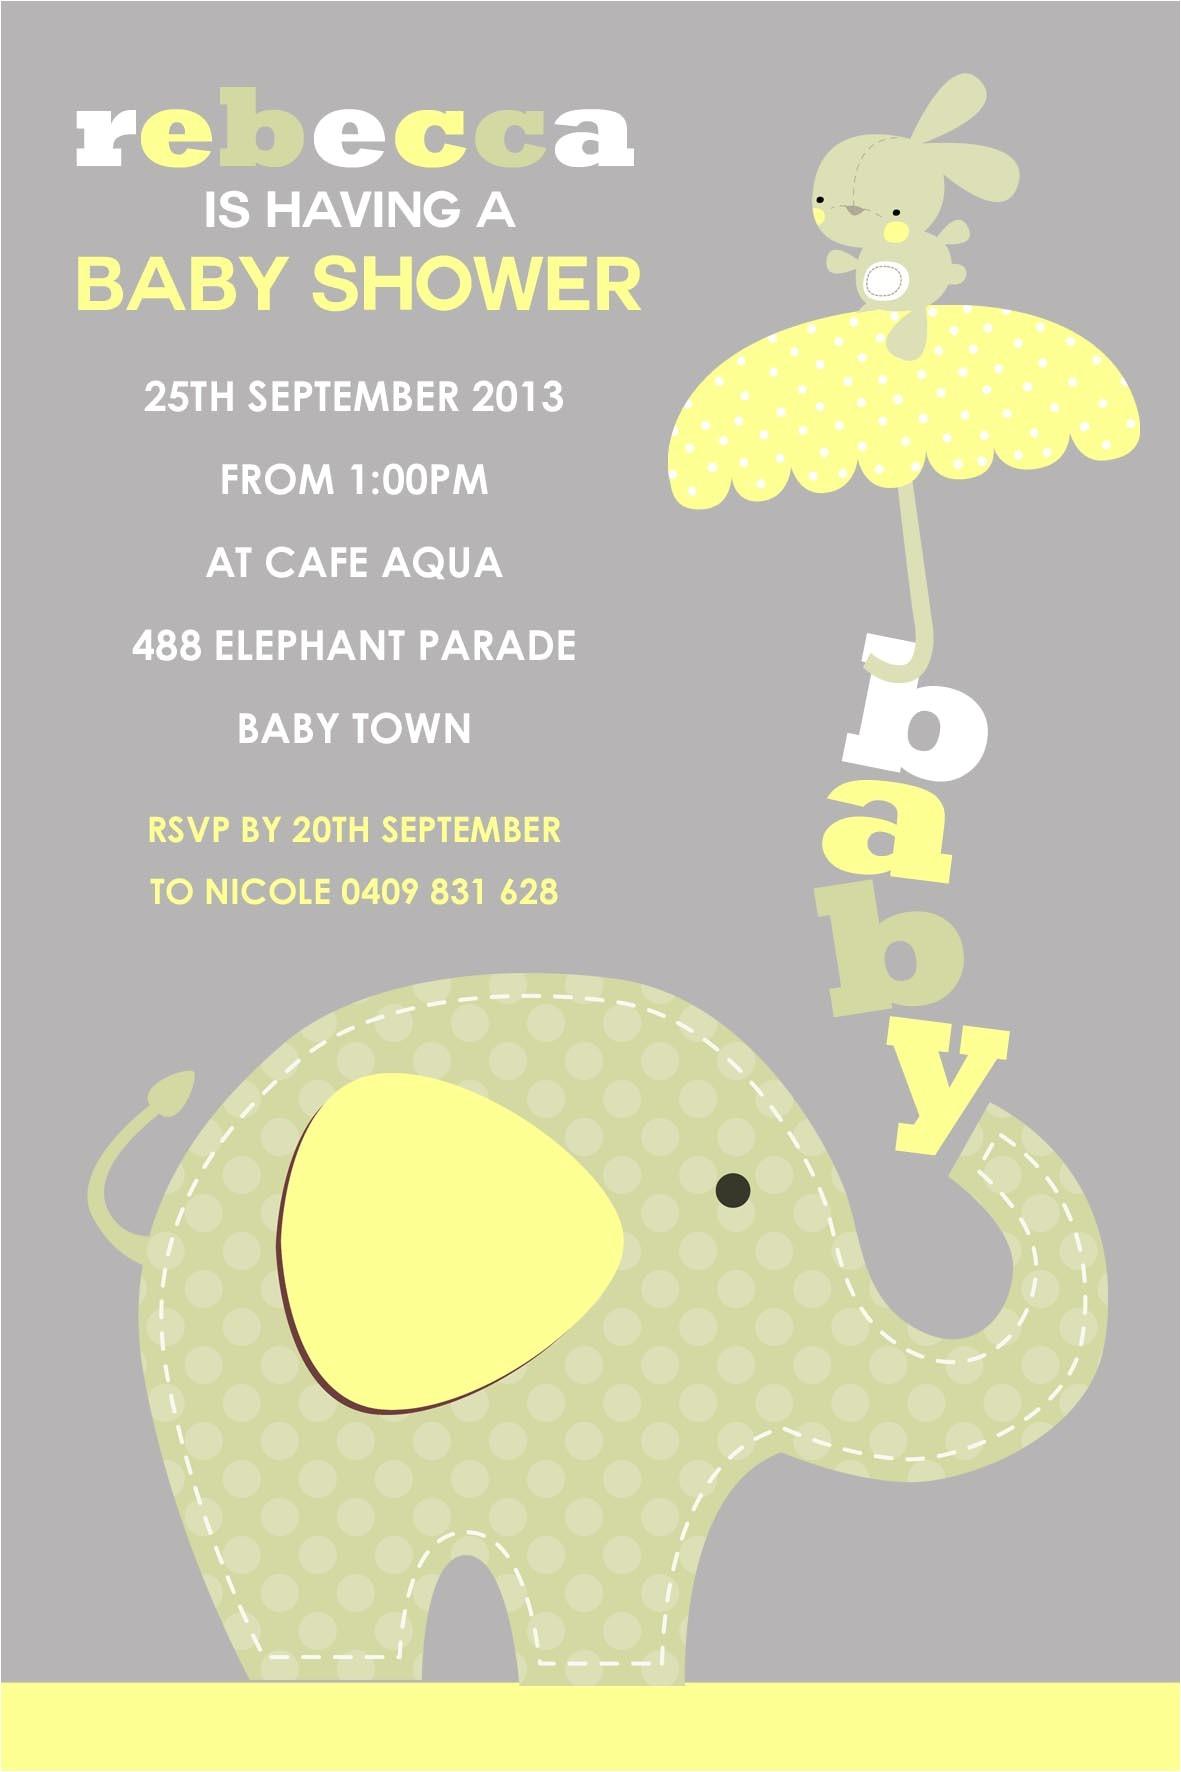 Online Editable Baby Shower Invitations New Free Editable Baby Shower Invitation Templates